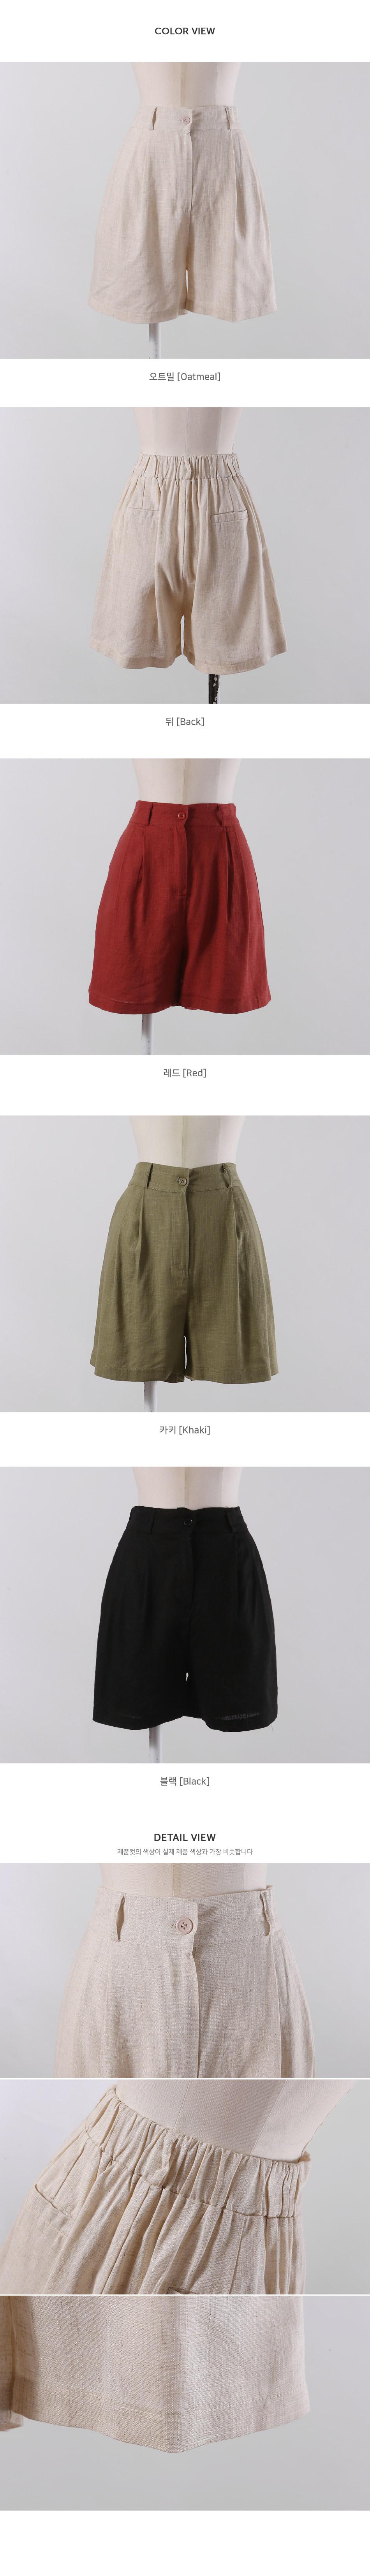 Deli linen pin tuck 4 slack pants